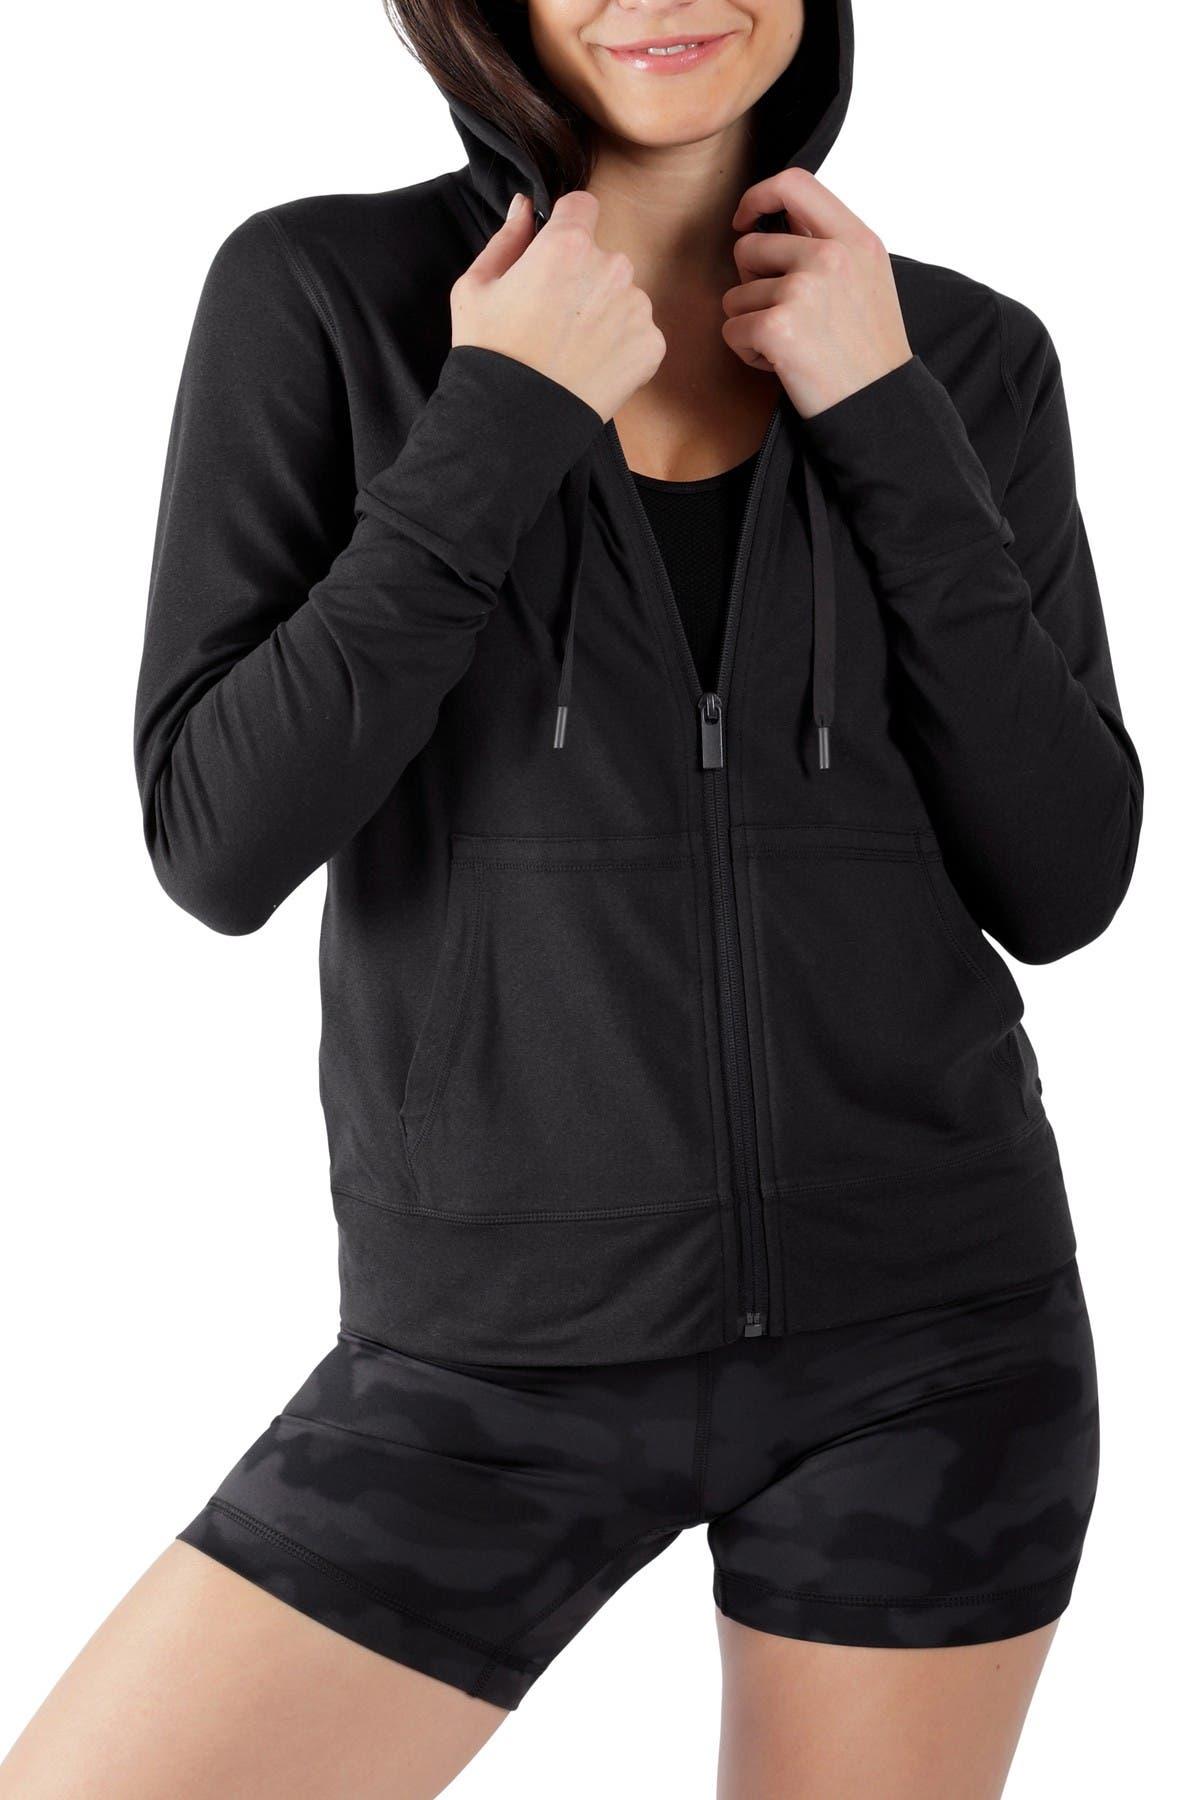 Image of 90 Degree By Reflex Oversized Full Zip Jacket